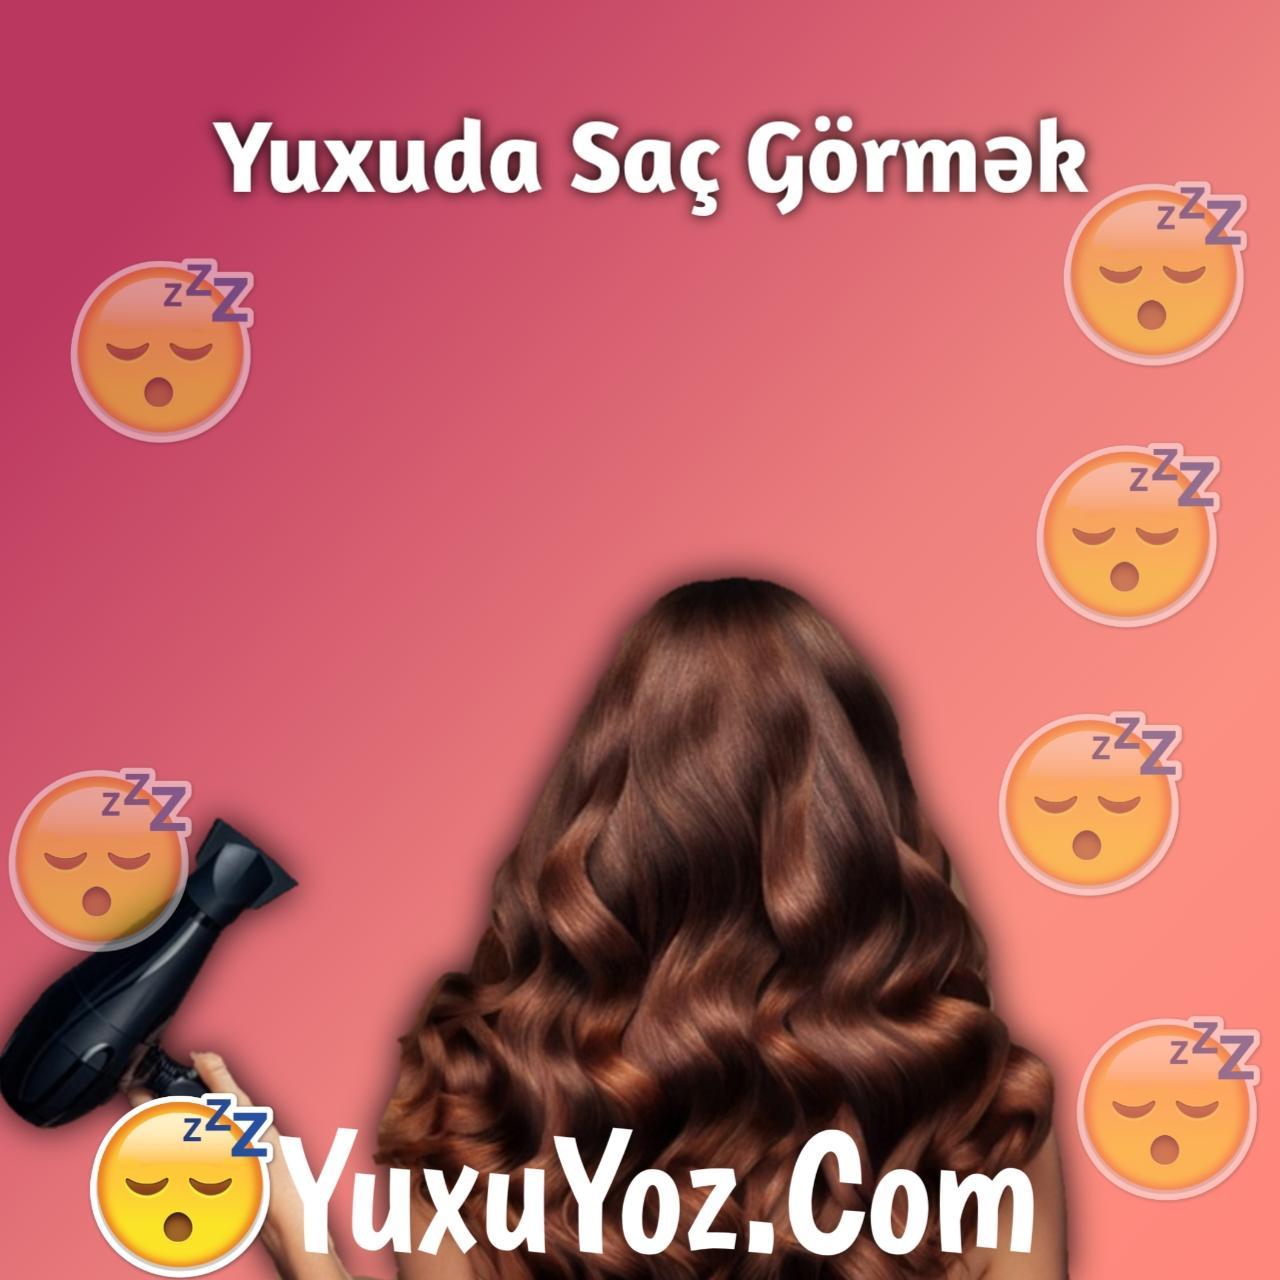 Yuxuda Sac Gormek